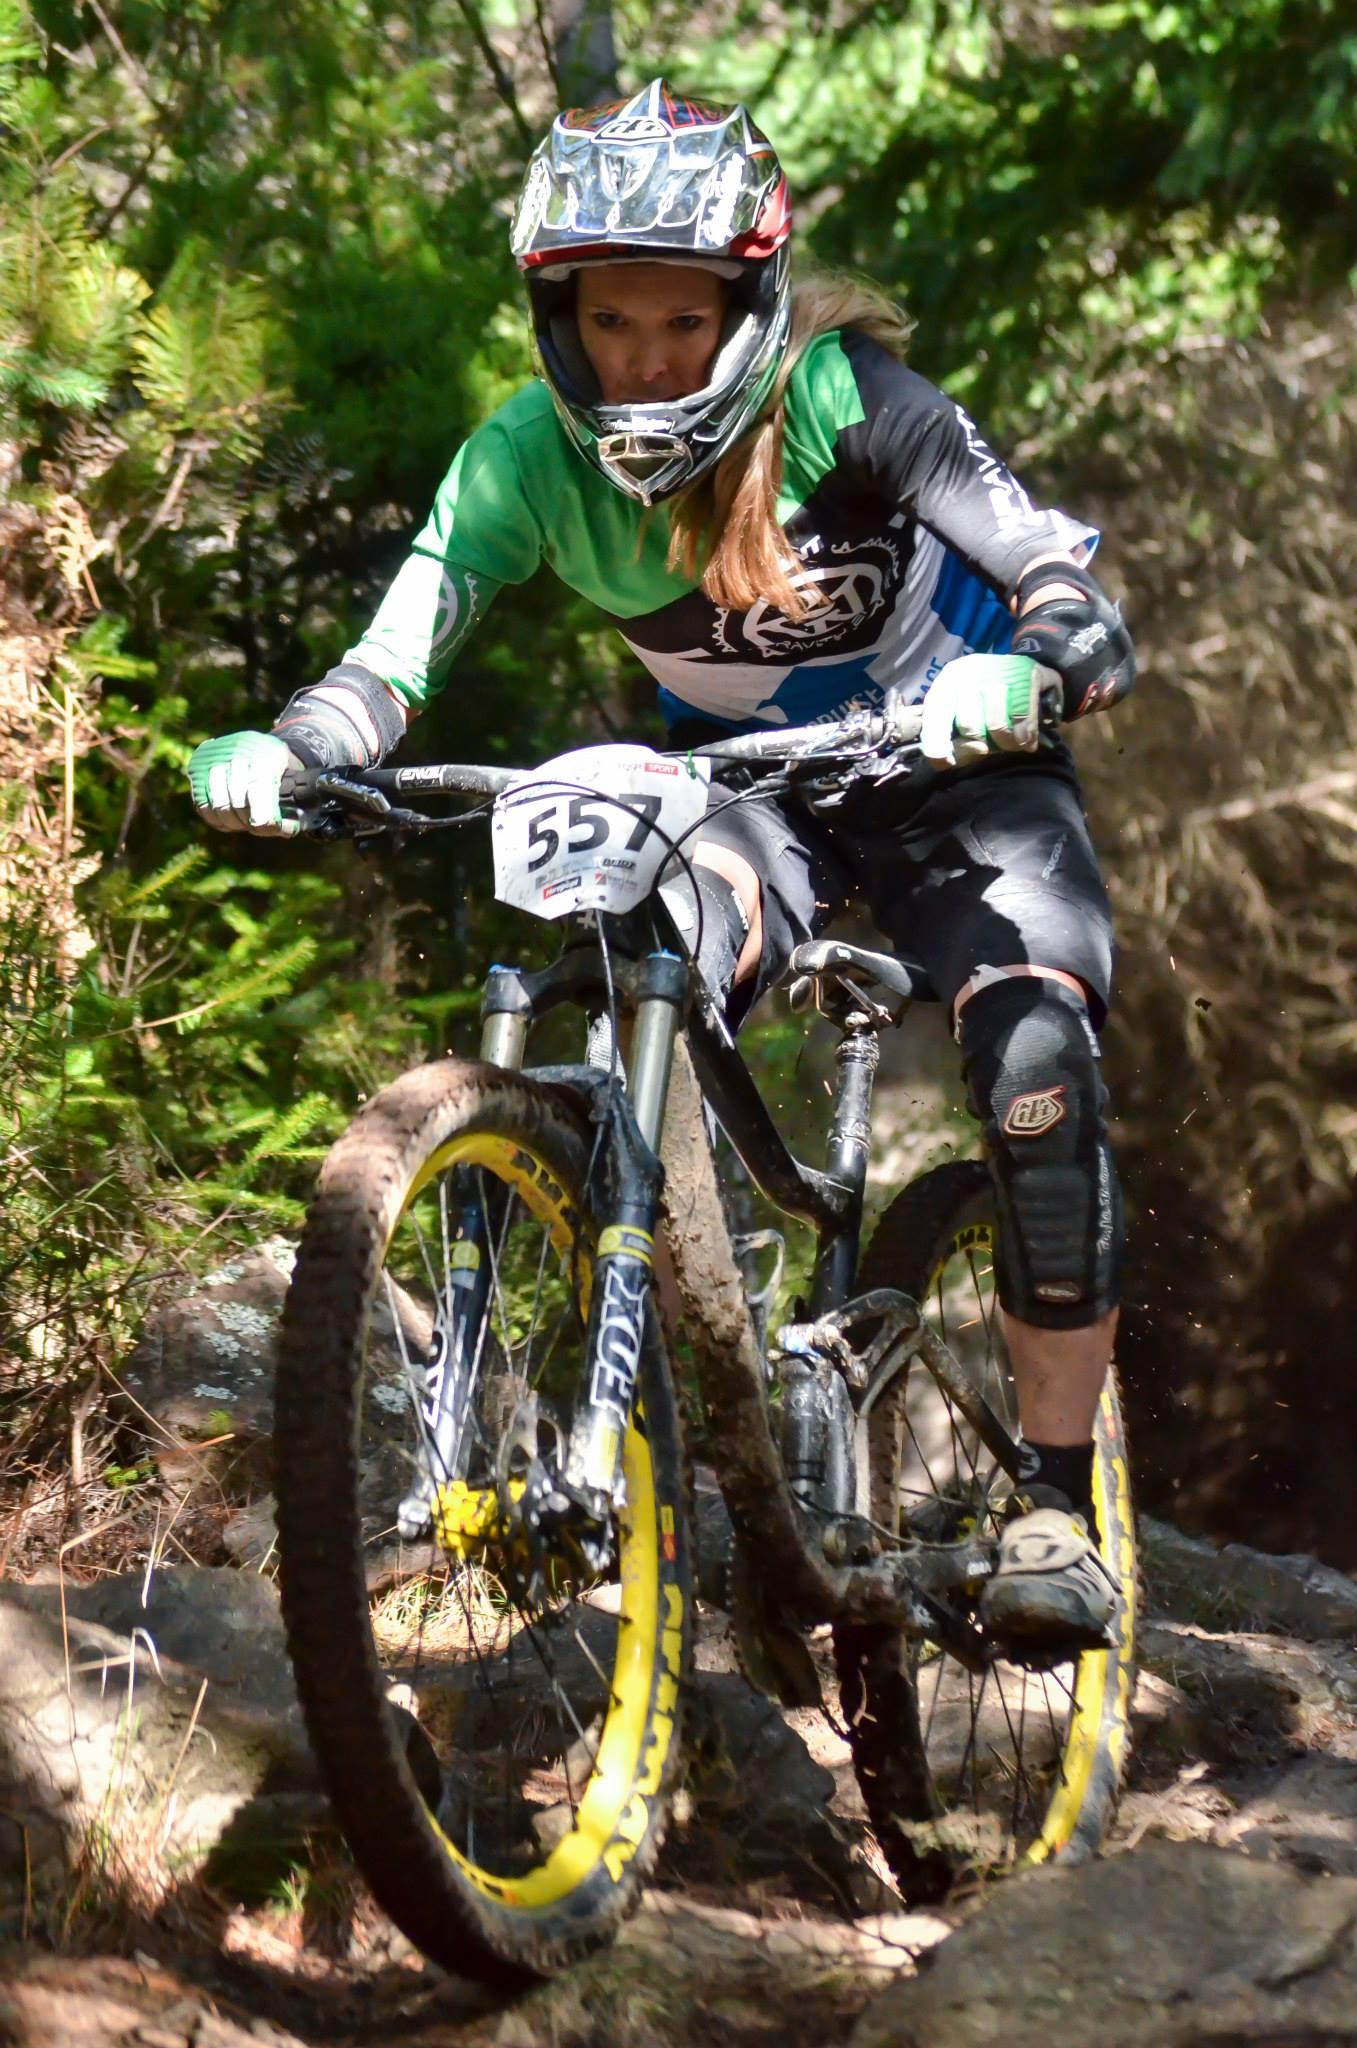 Crankworx Rotorua Enduro wildcard Raewyn Morrison